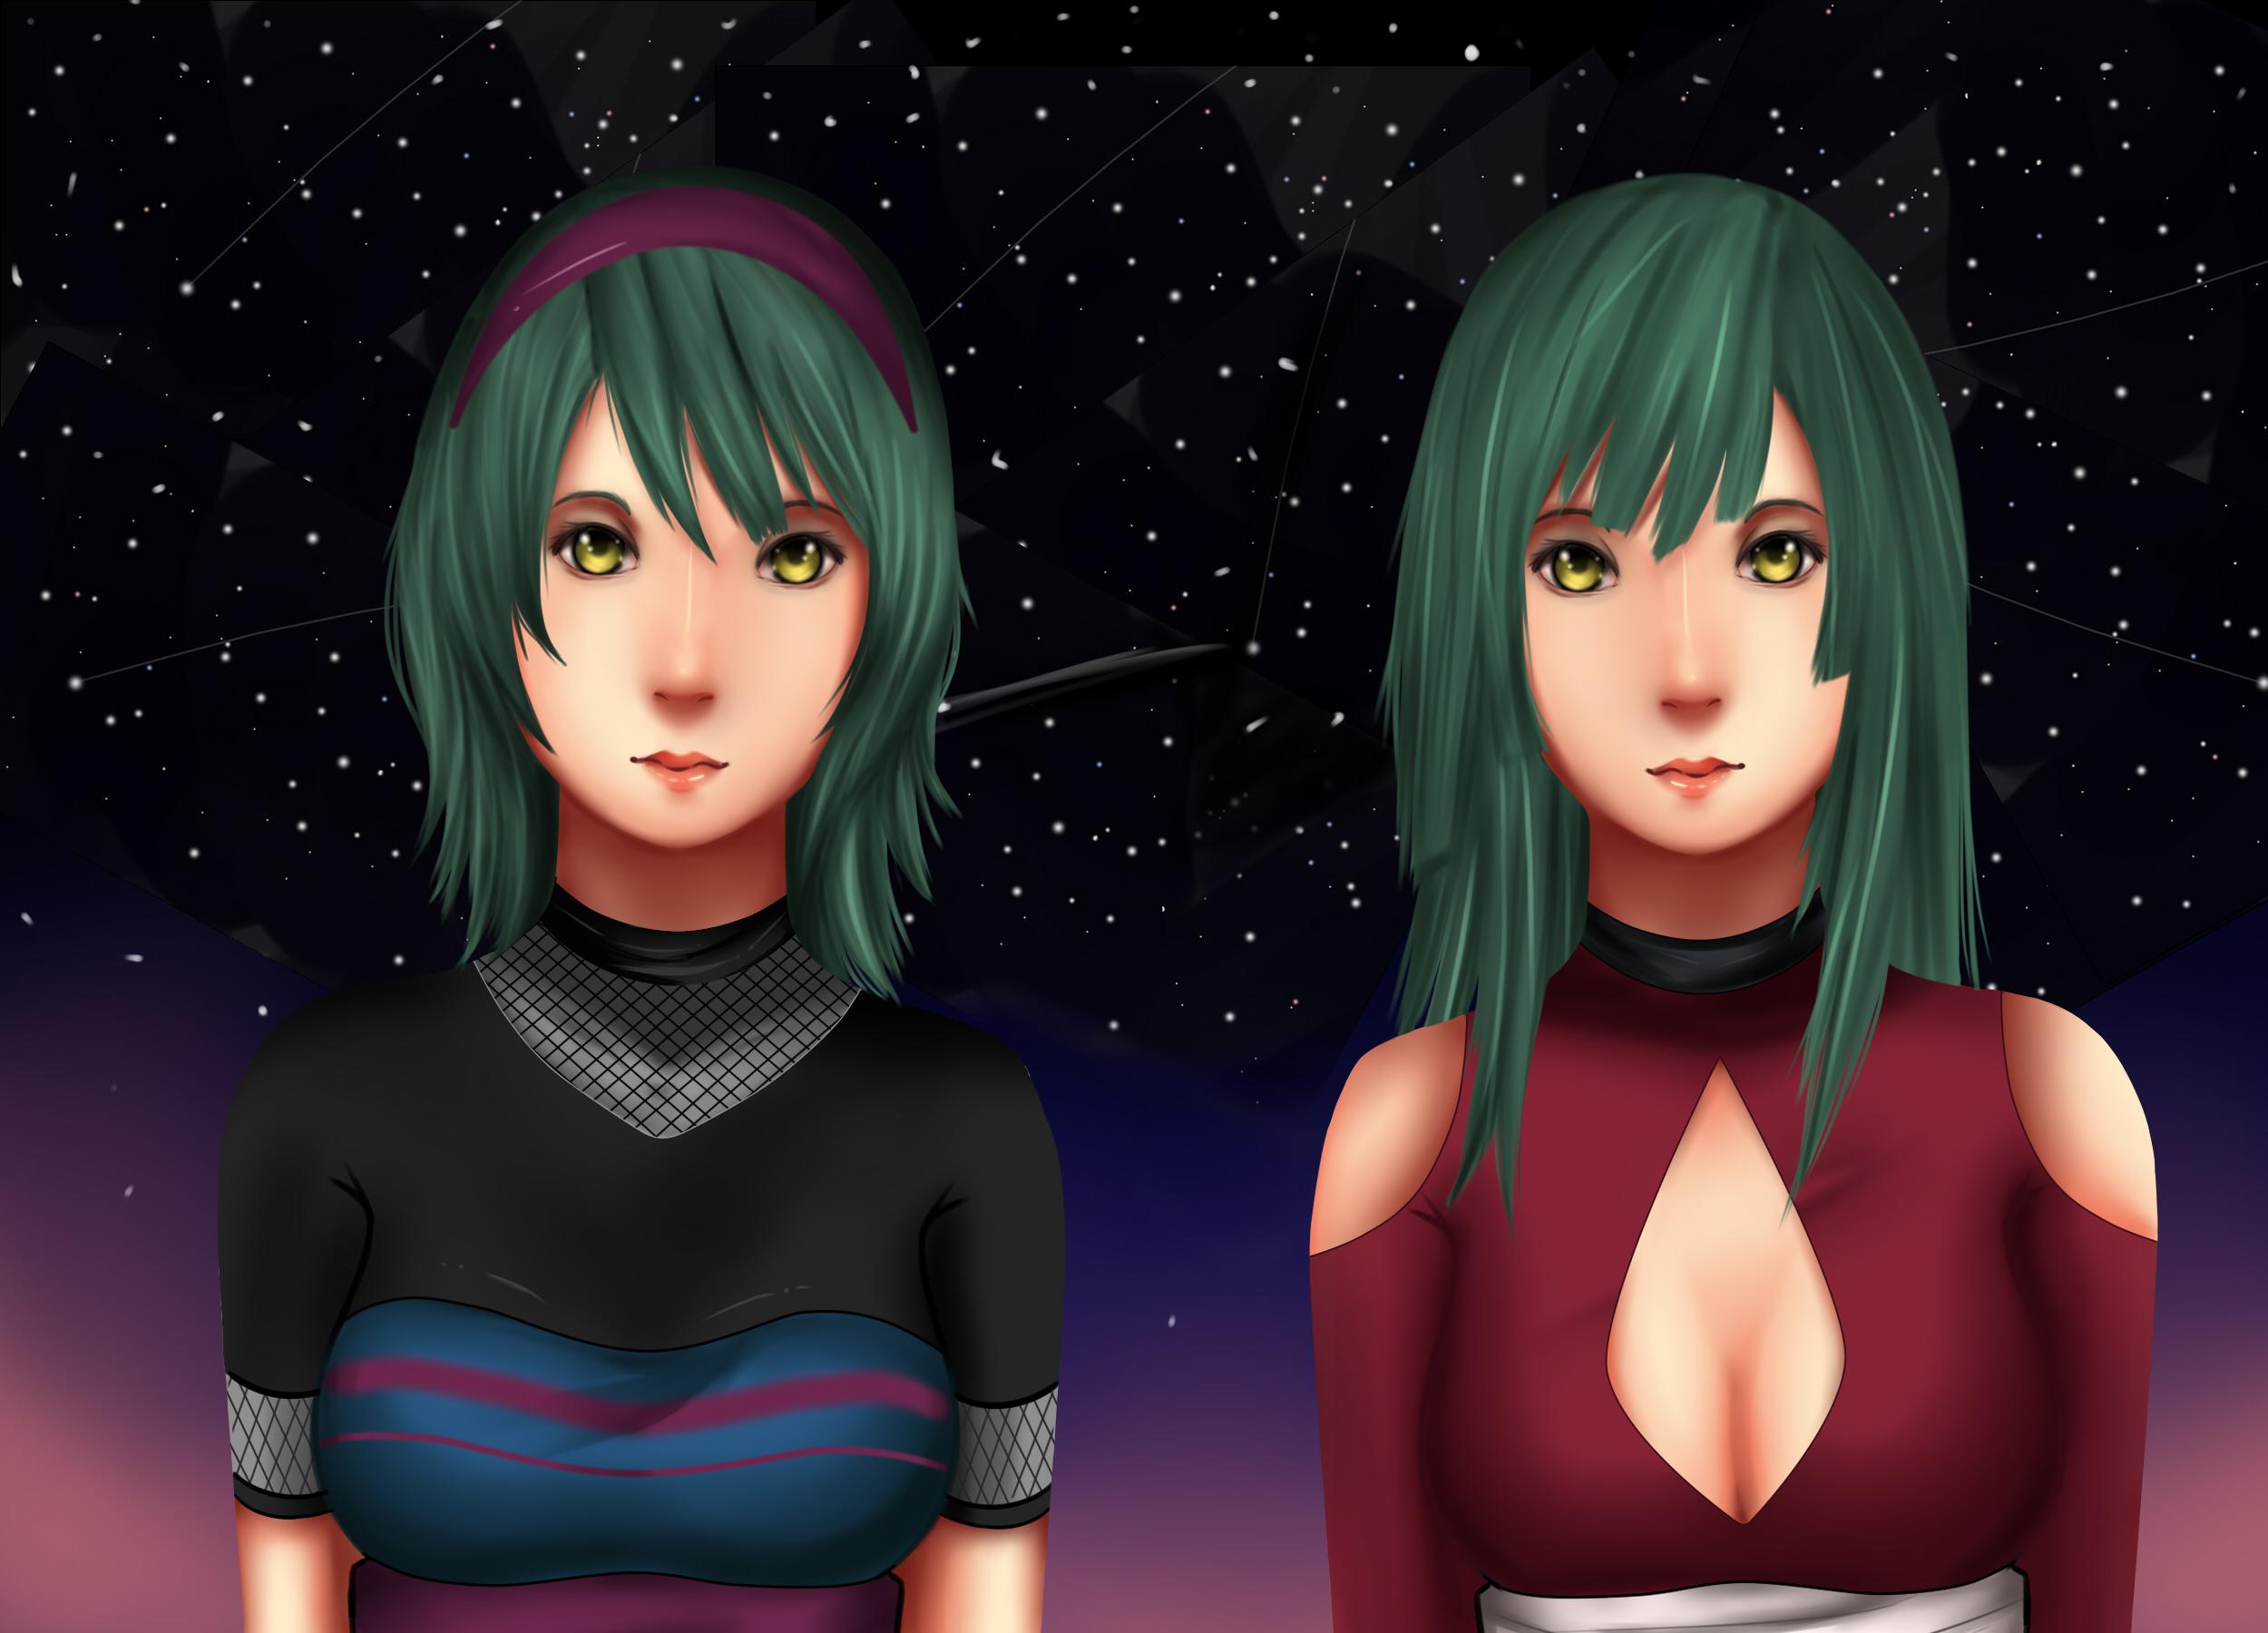 kyuuka and hanabira by xkynthiax